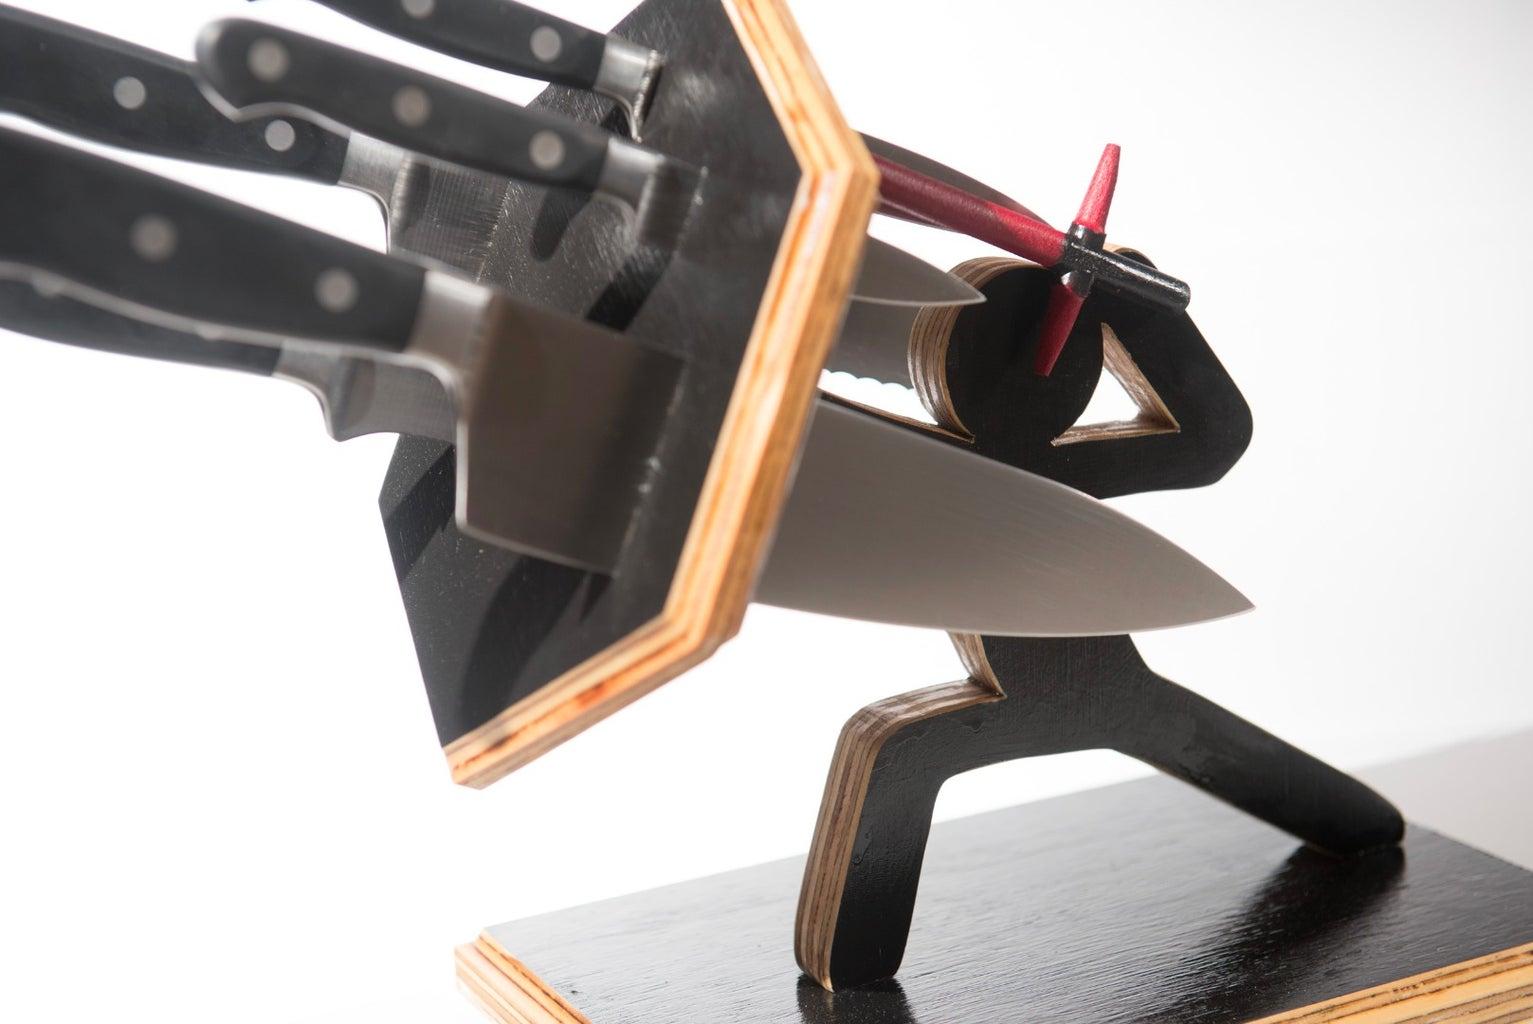 The Force Awakens Knife Block